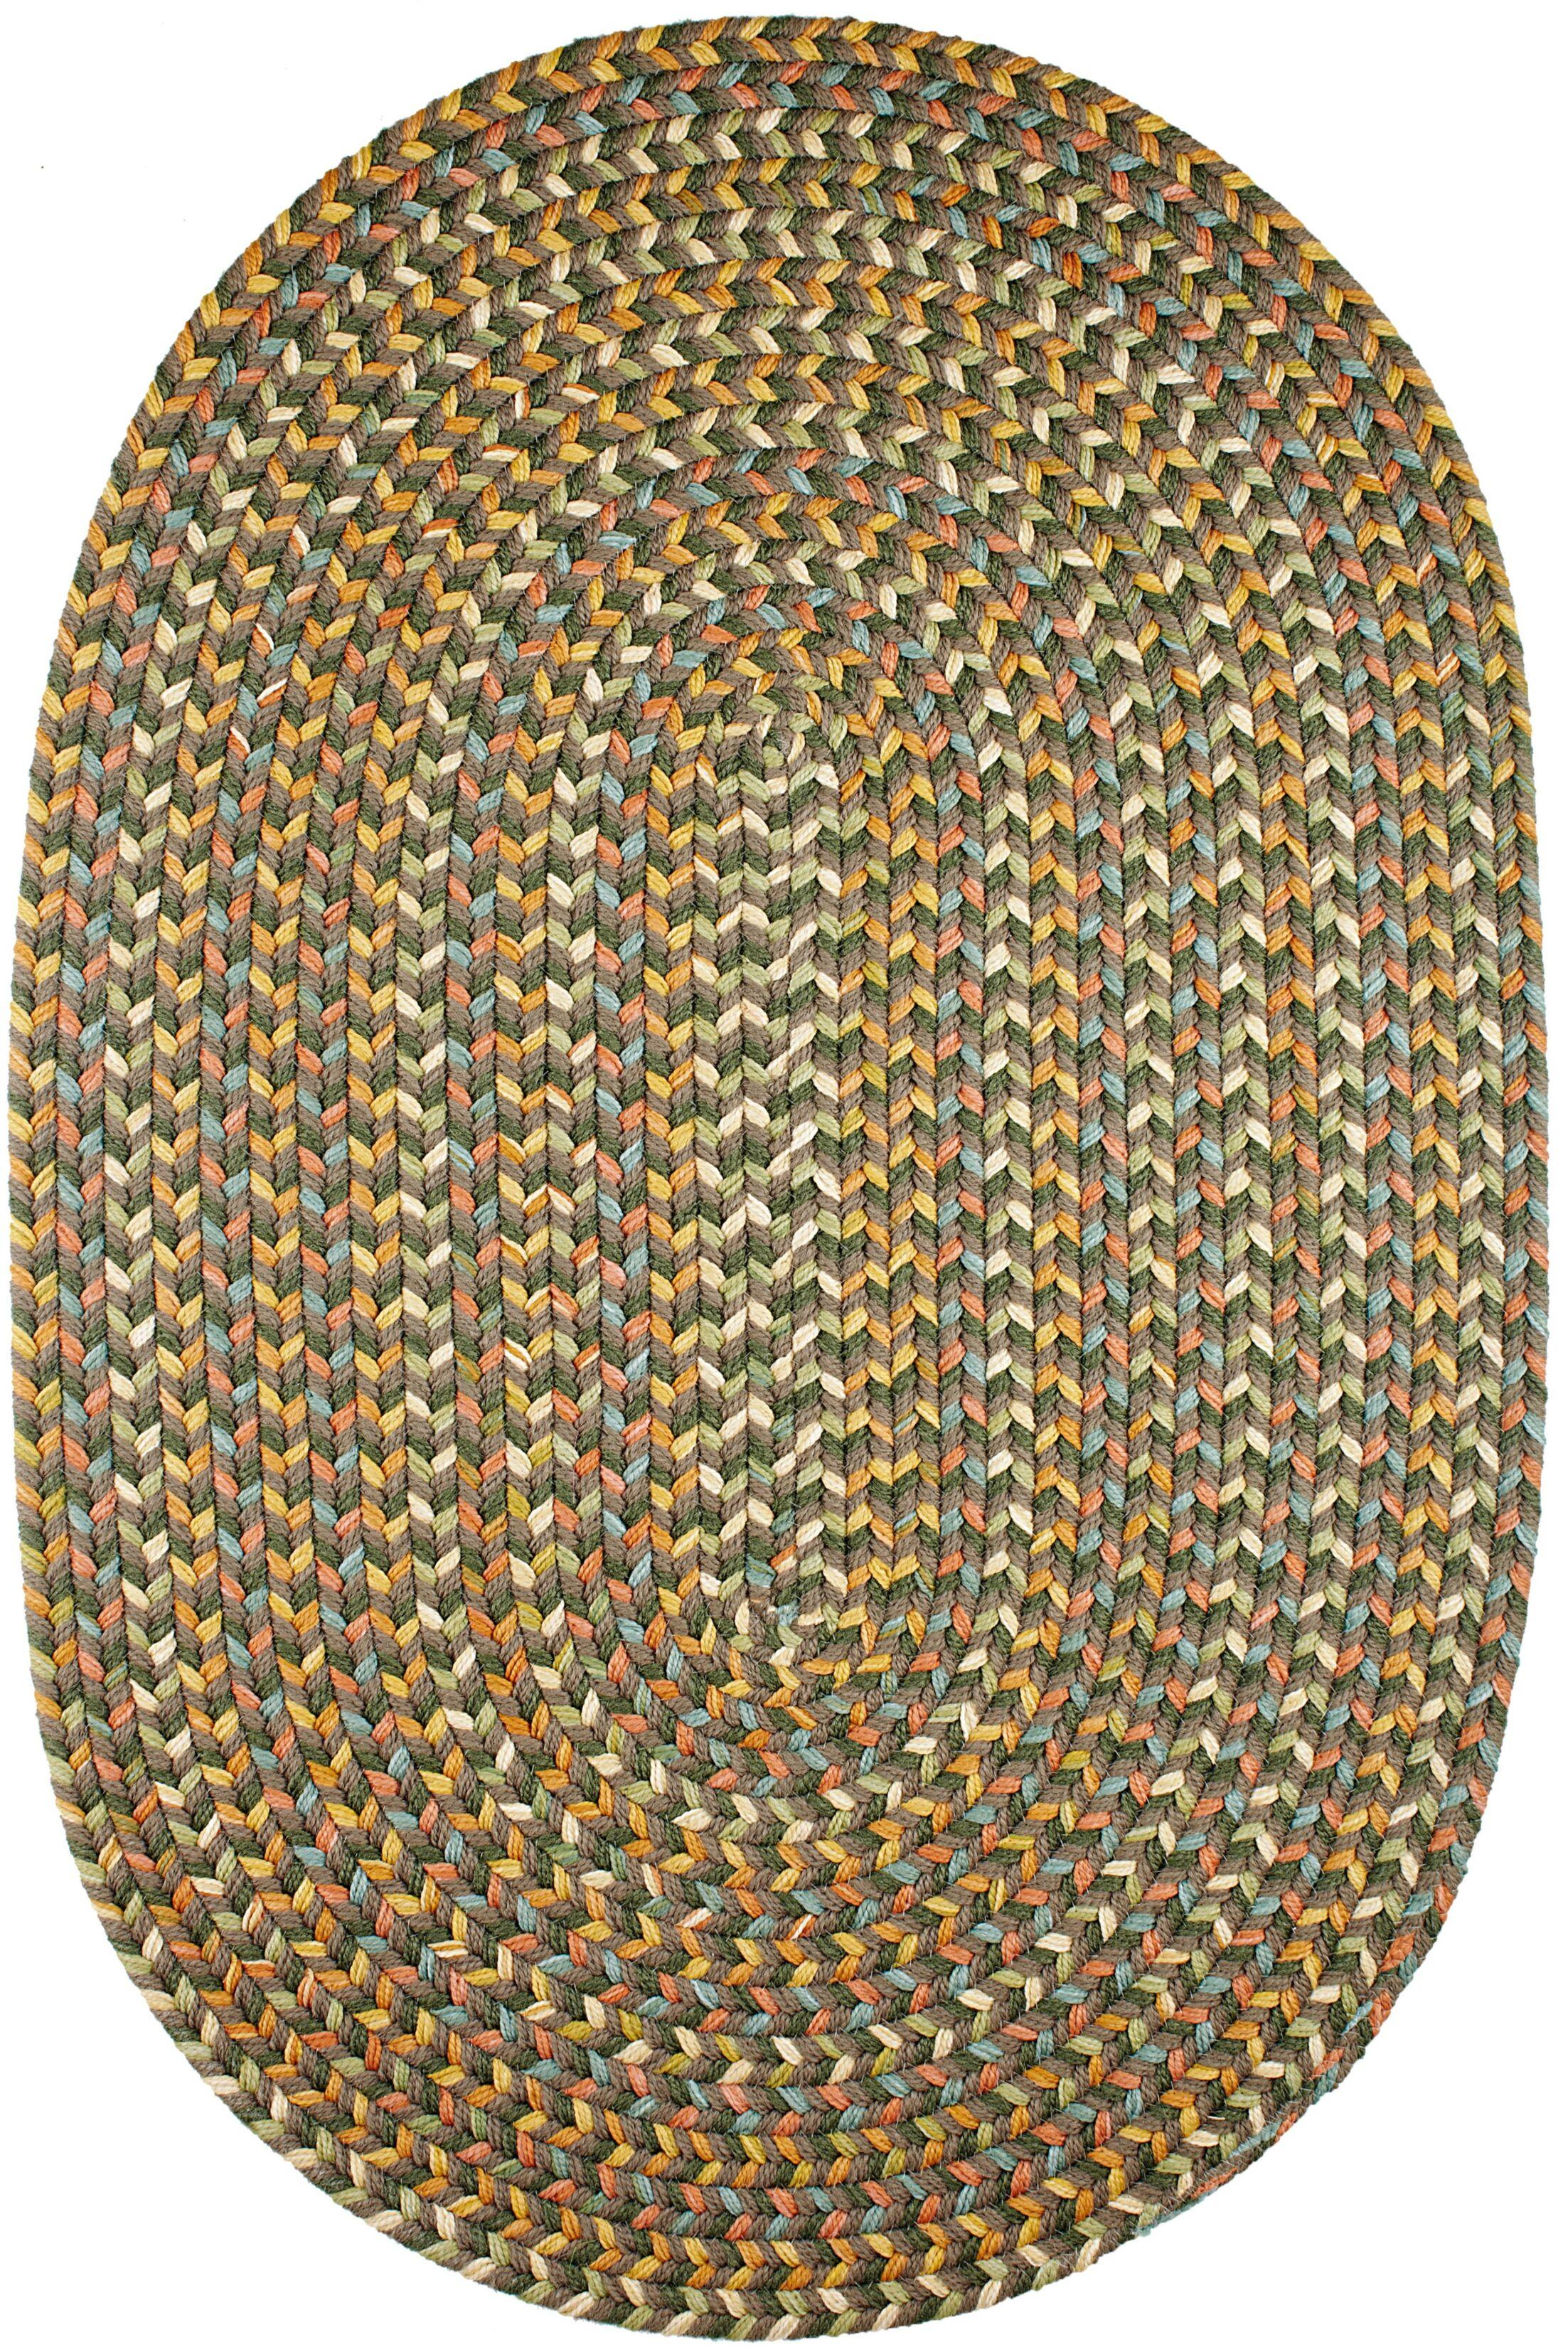 Handmade Dark Taupe Indoor/Outdoor Area Rug Rug Size: Oval 7' x 9'